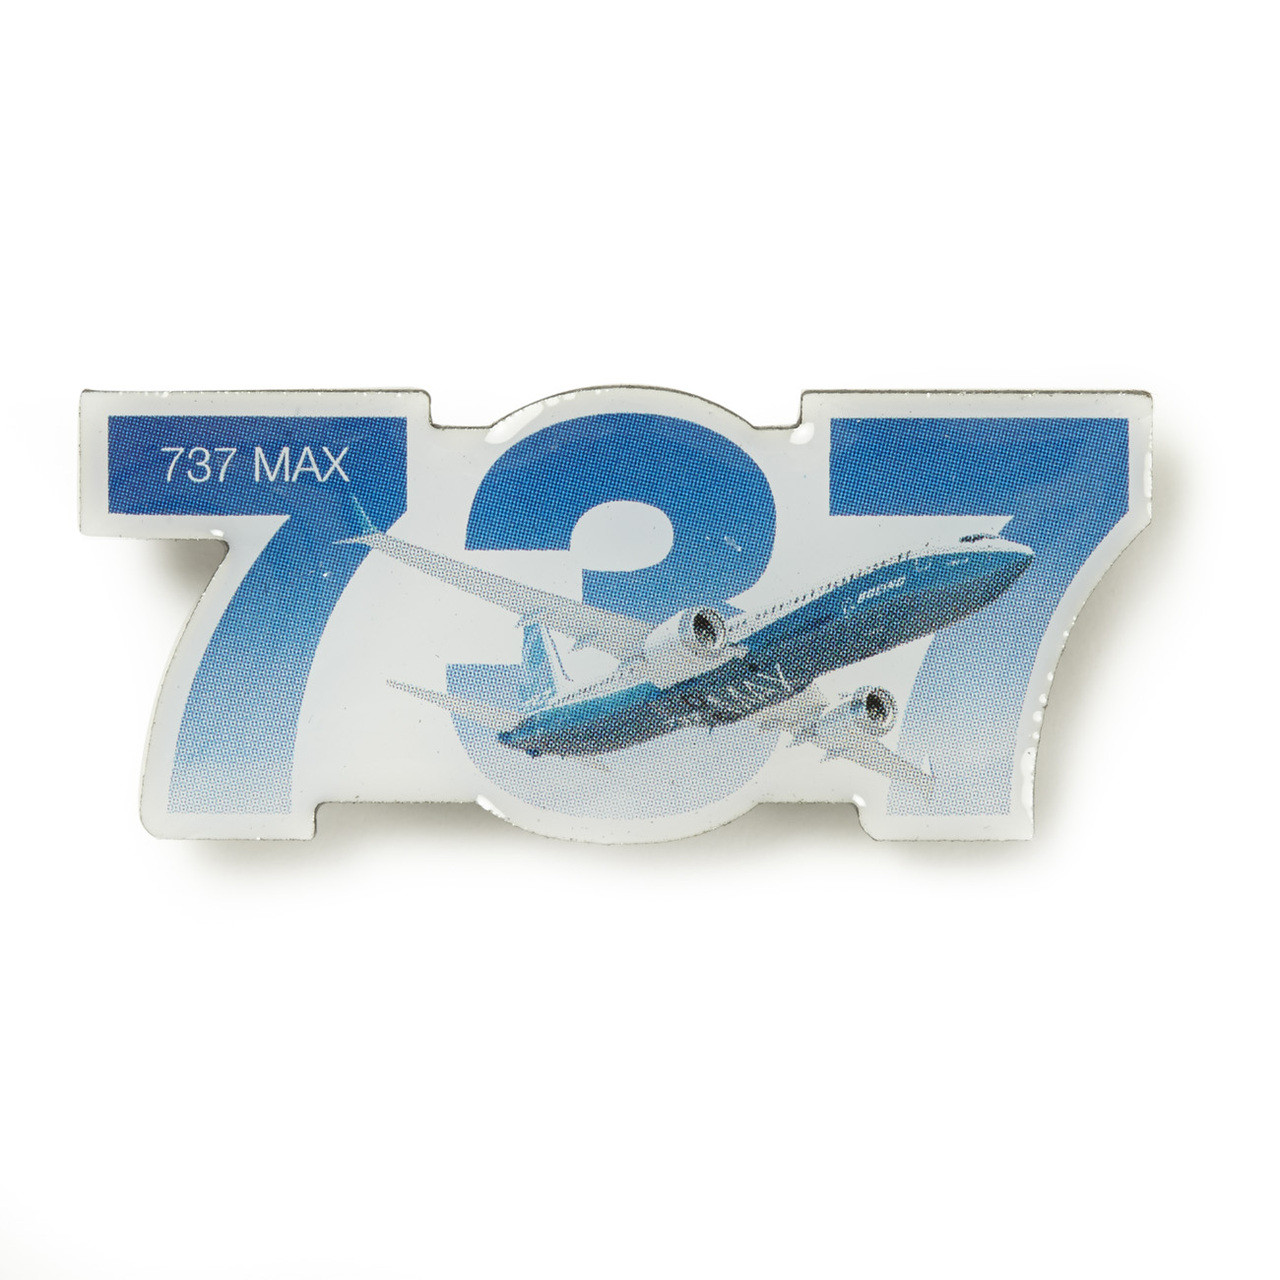 Boeing 737 MAX Sky Pin